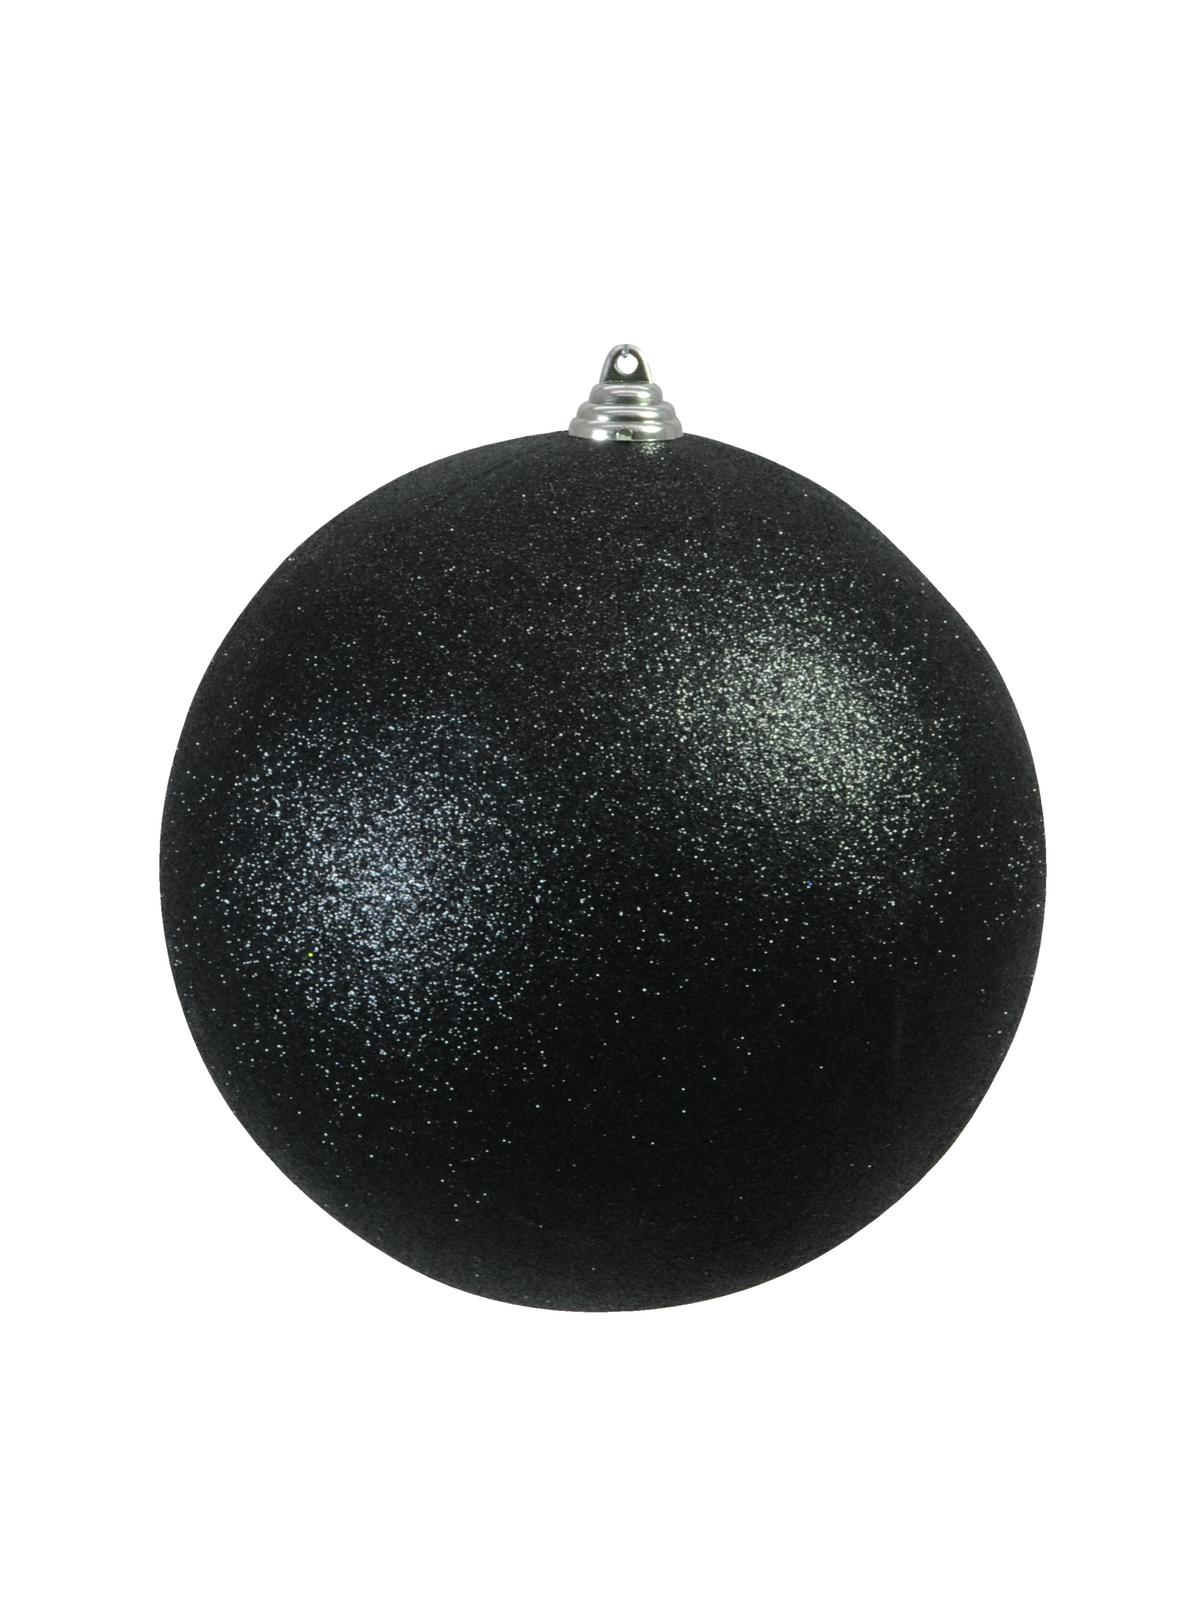 Balls Balls christmas Plastic 20Cm for Tree decoration 4 pcs Black Glitter